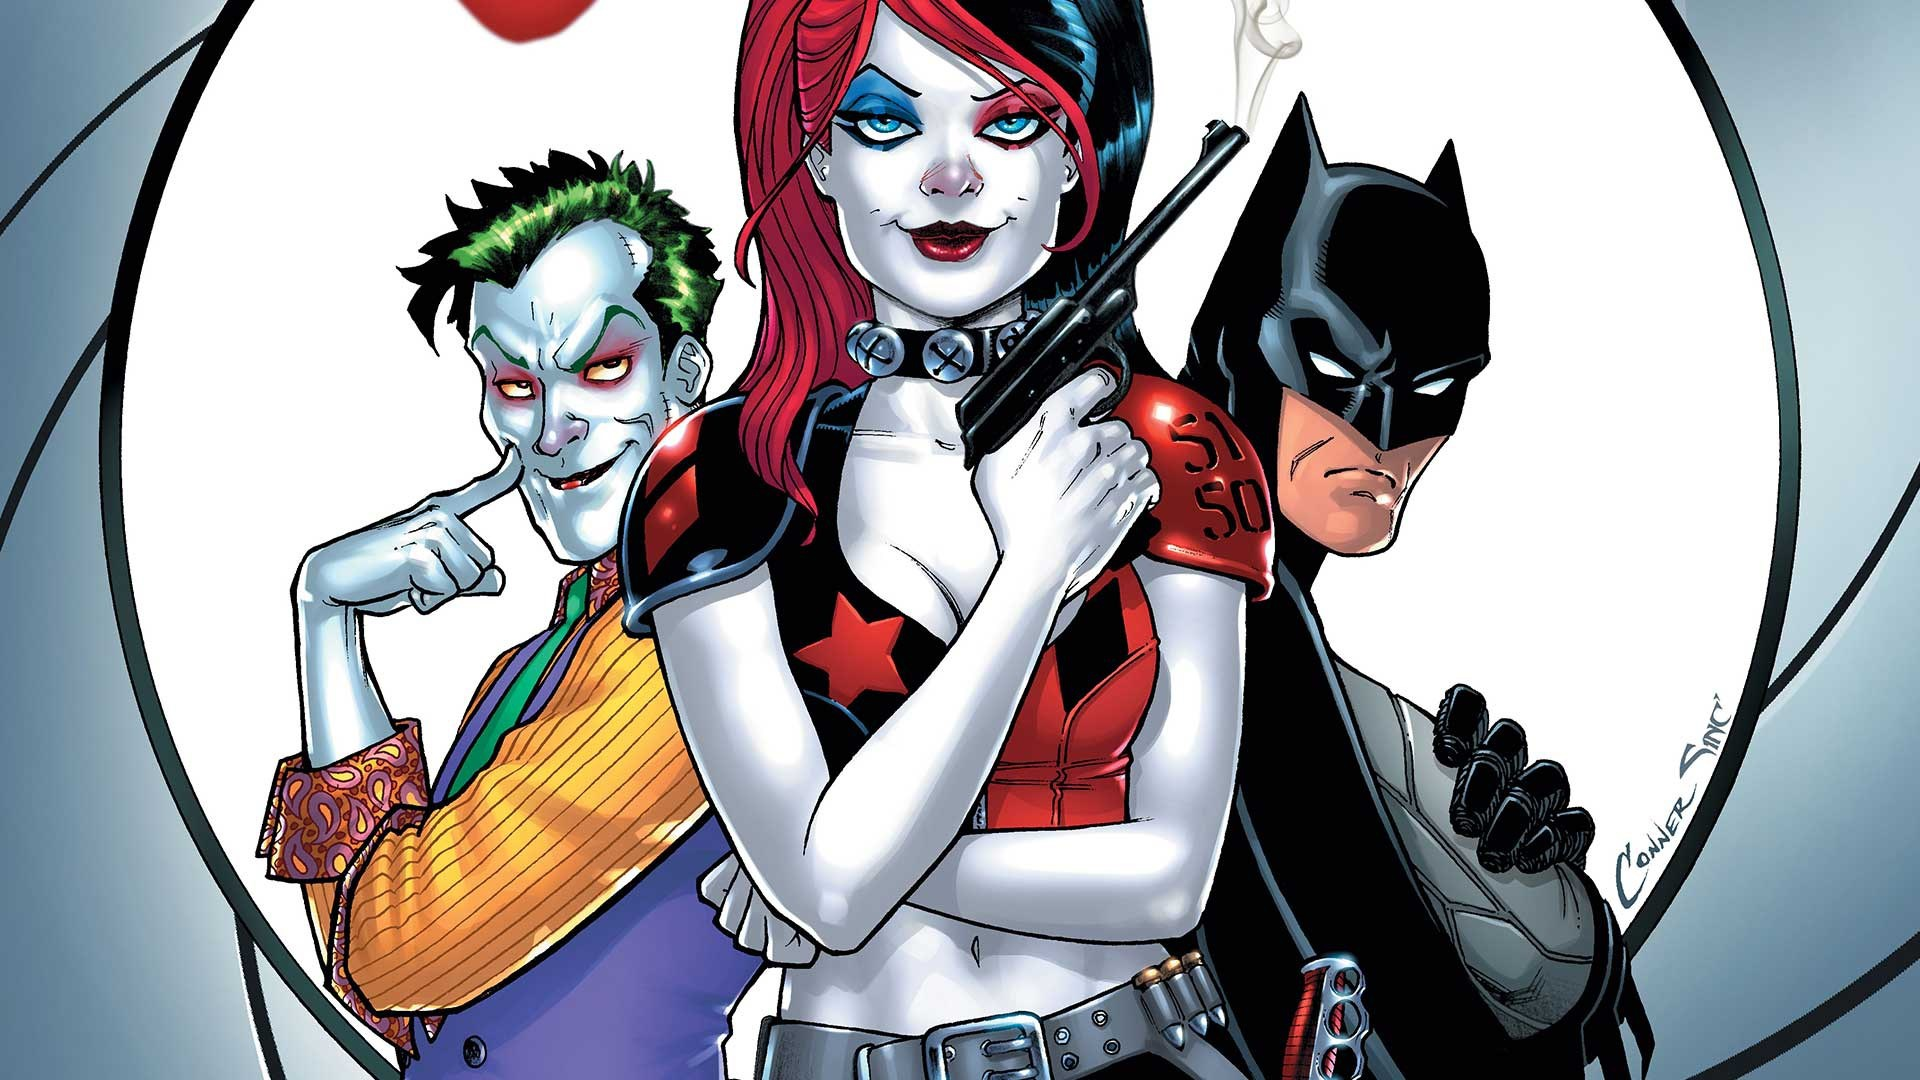 Batman Dc Comics Harley Quinn Joker 1920x1080